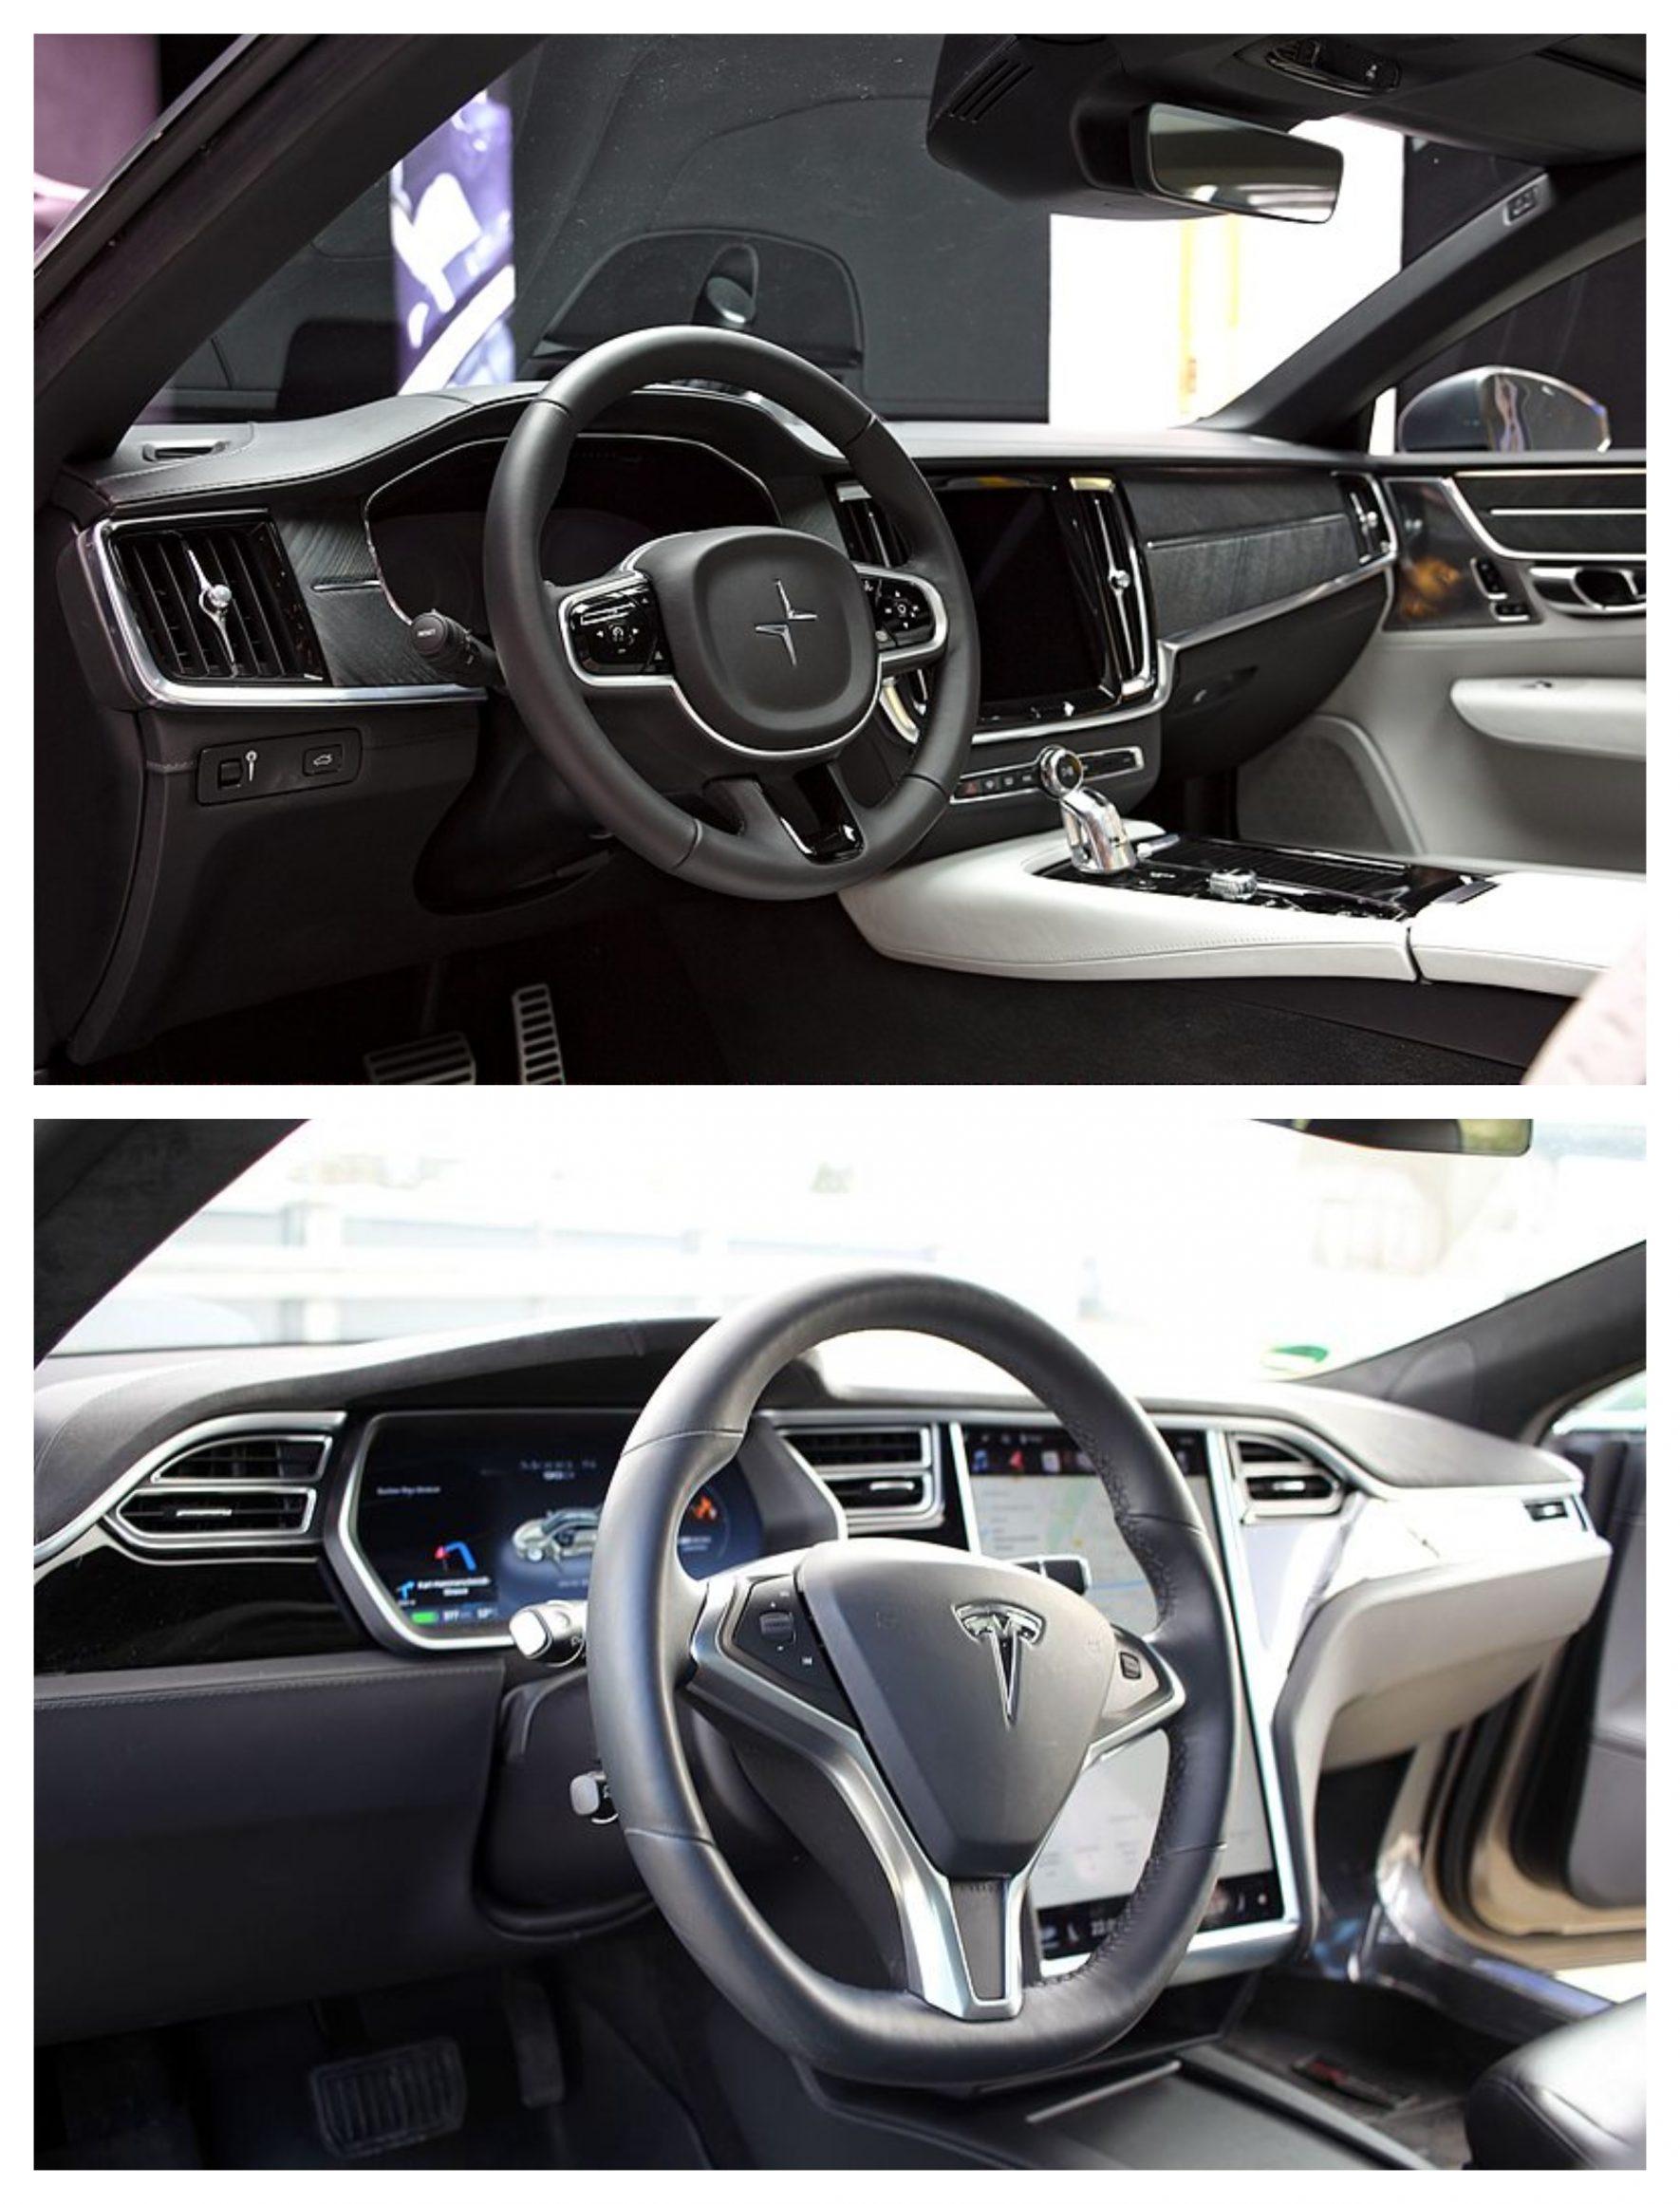 Polestar Vs Tesla 2 interior